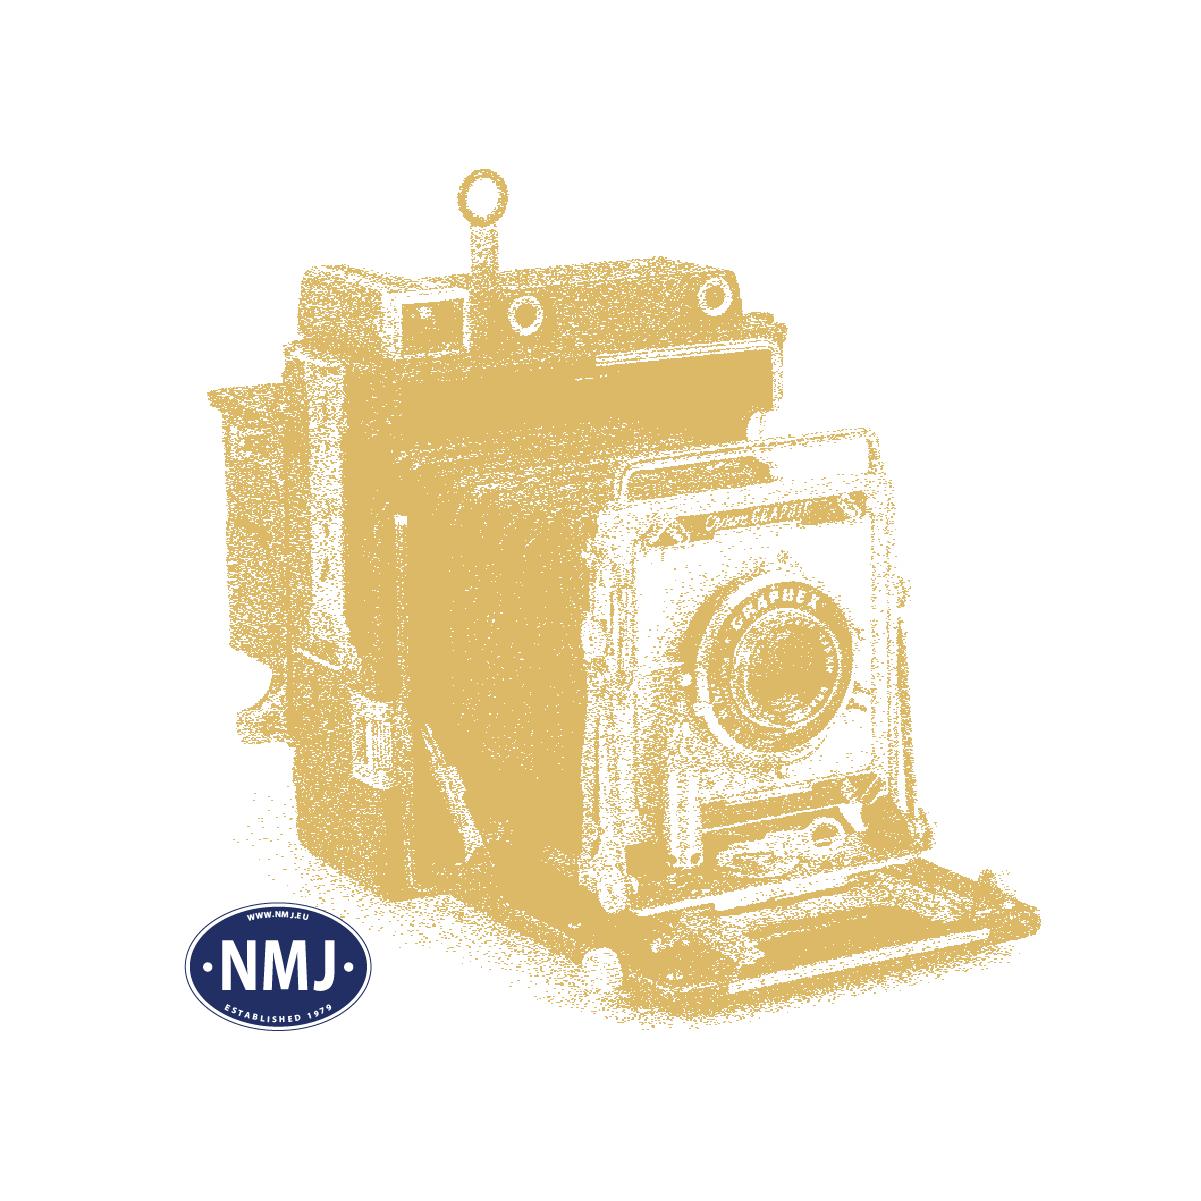 NMJT503.109 - NMJ Topline Gbkl 118 4215-5 der NSB